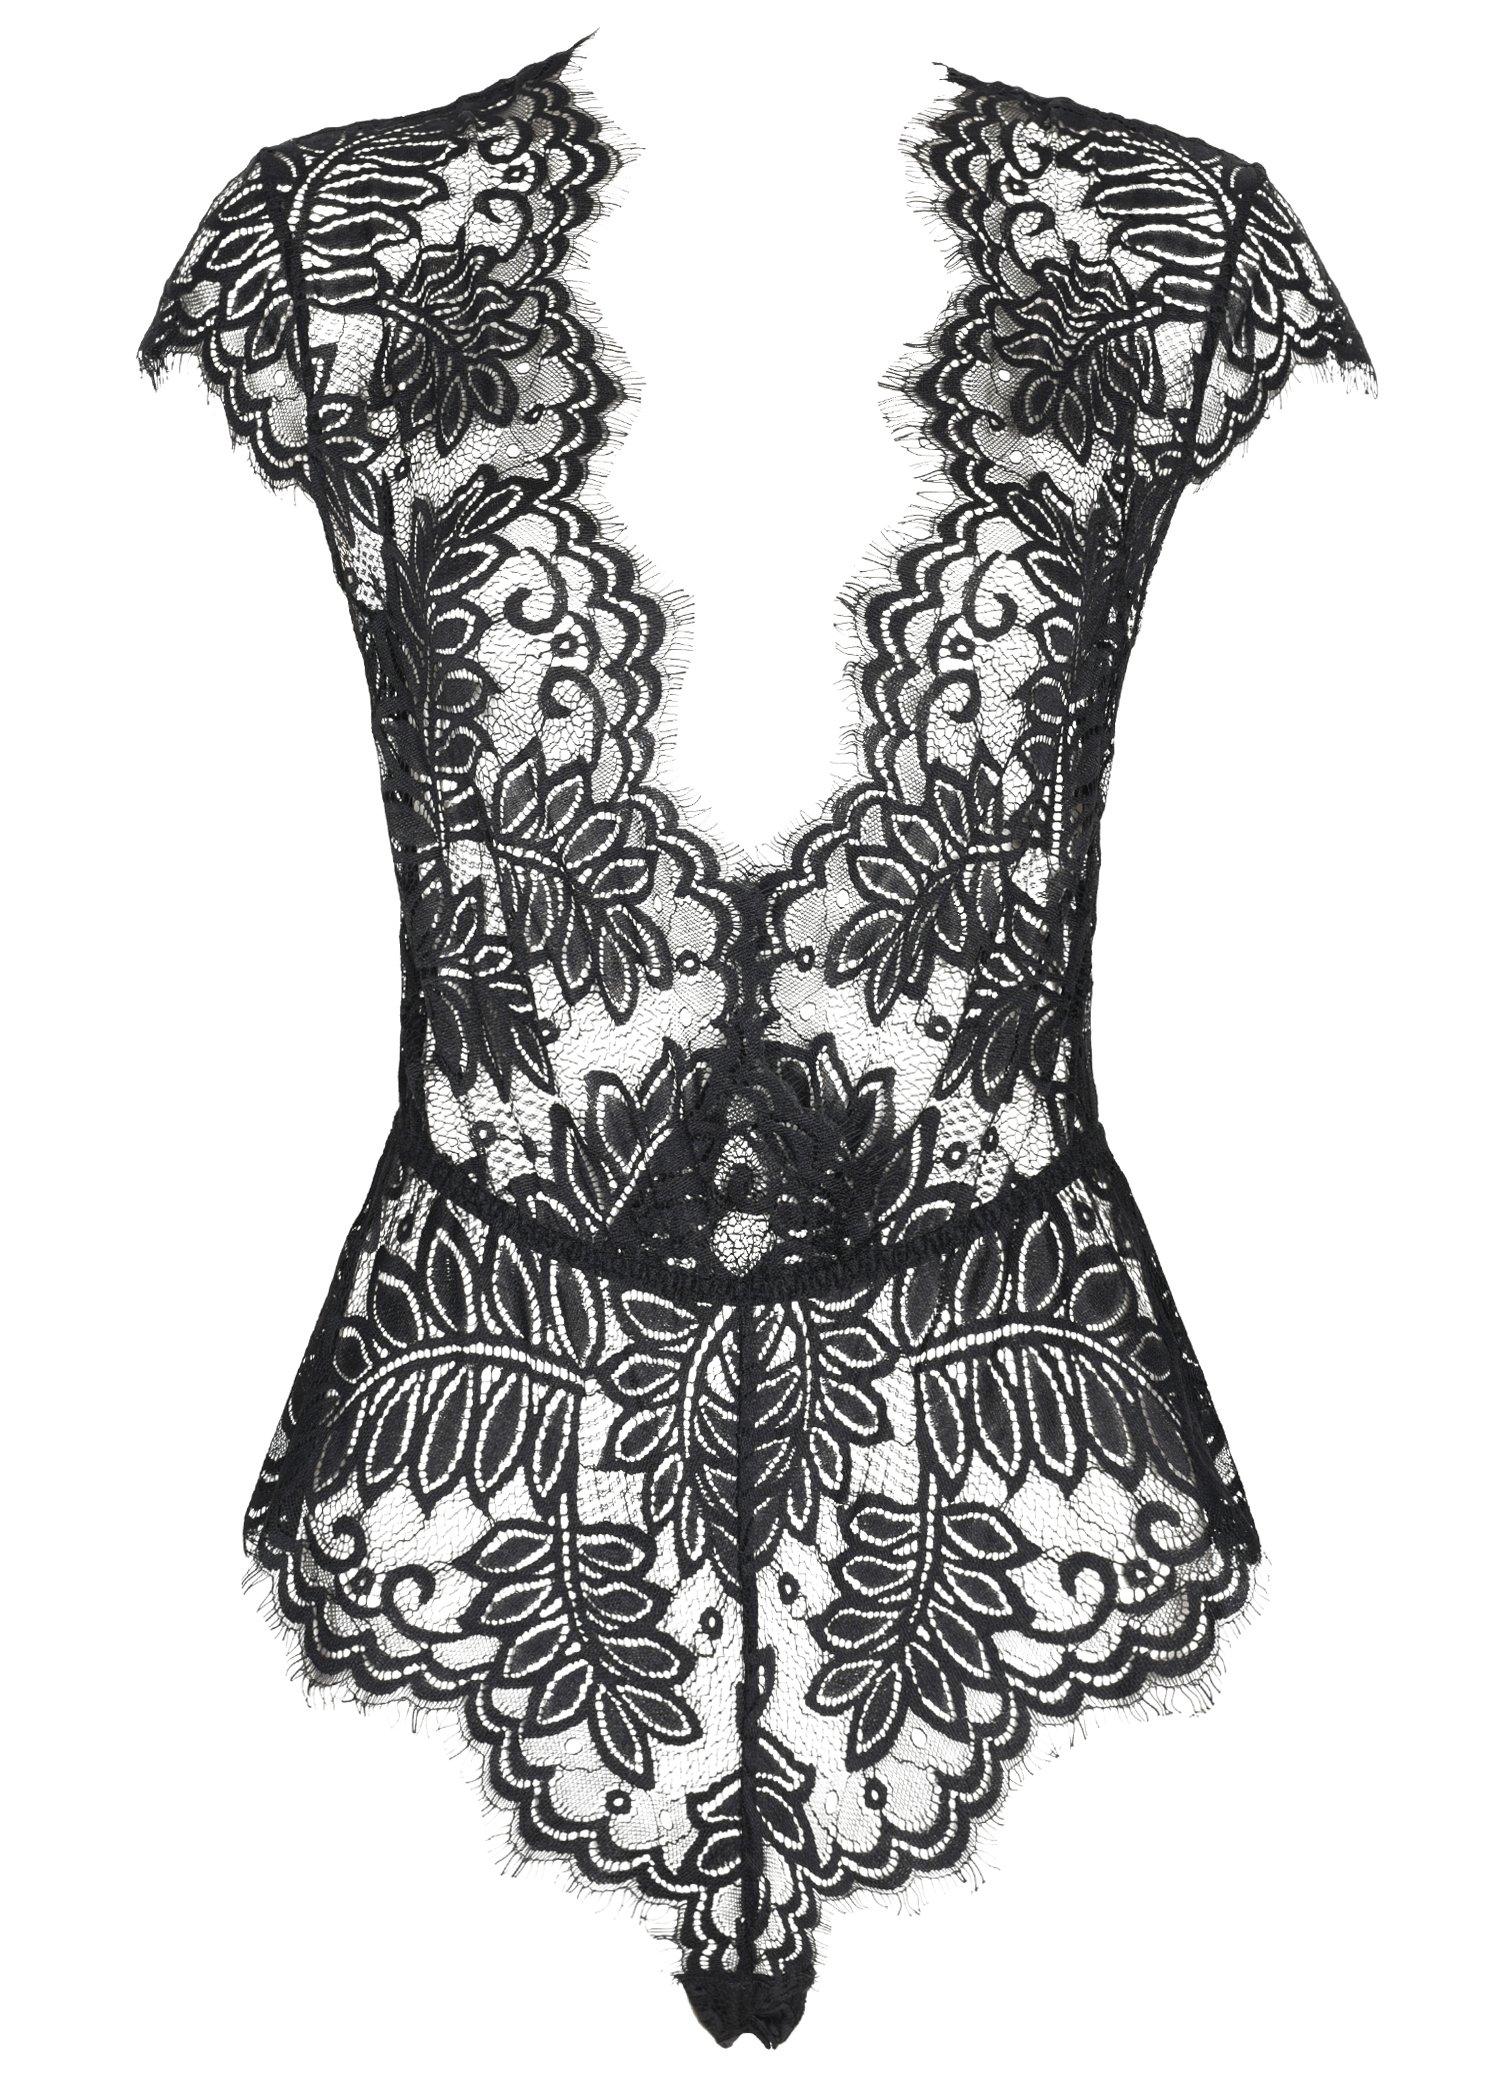 AvaLolita Women's Lingerie Floral Lace Bodysuit Deep V Babydoll M Black